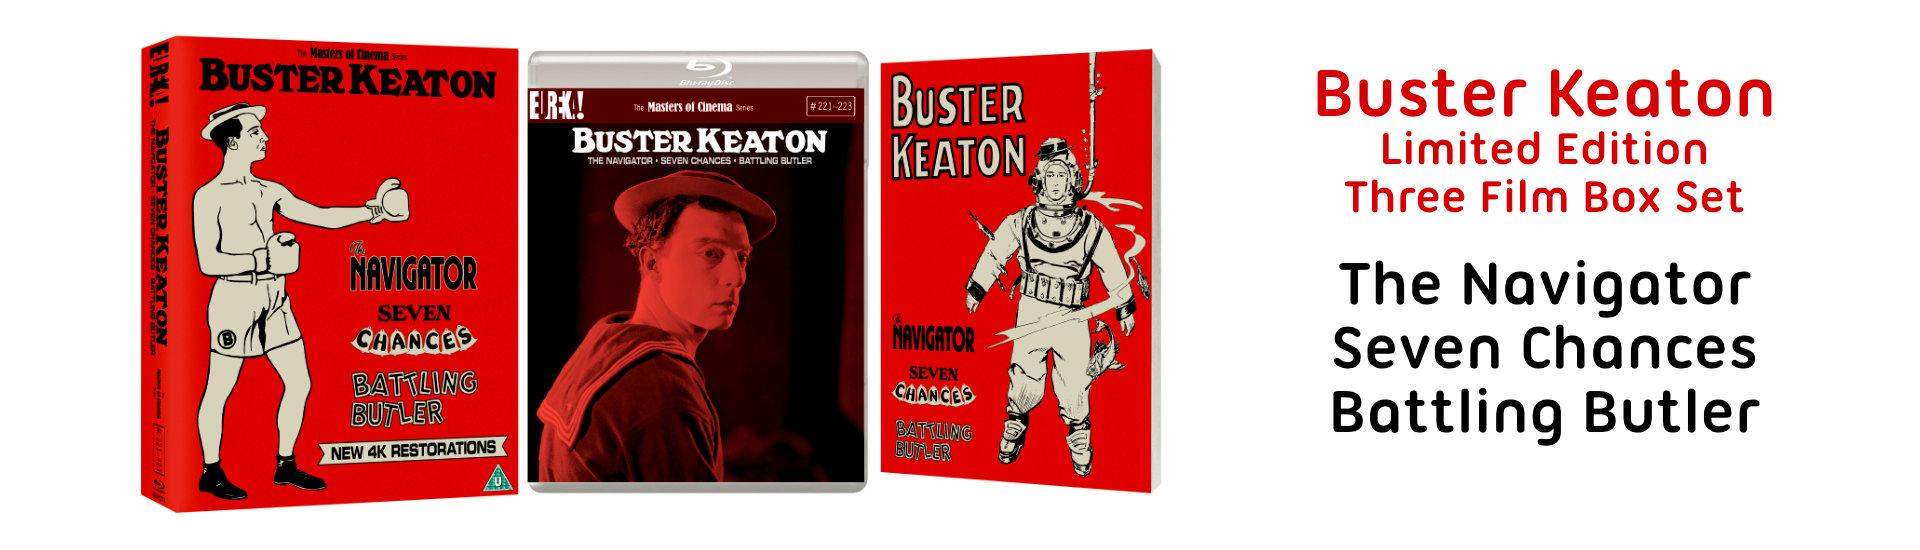 SLIDE - Buster Keaton